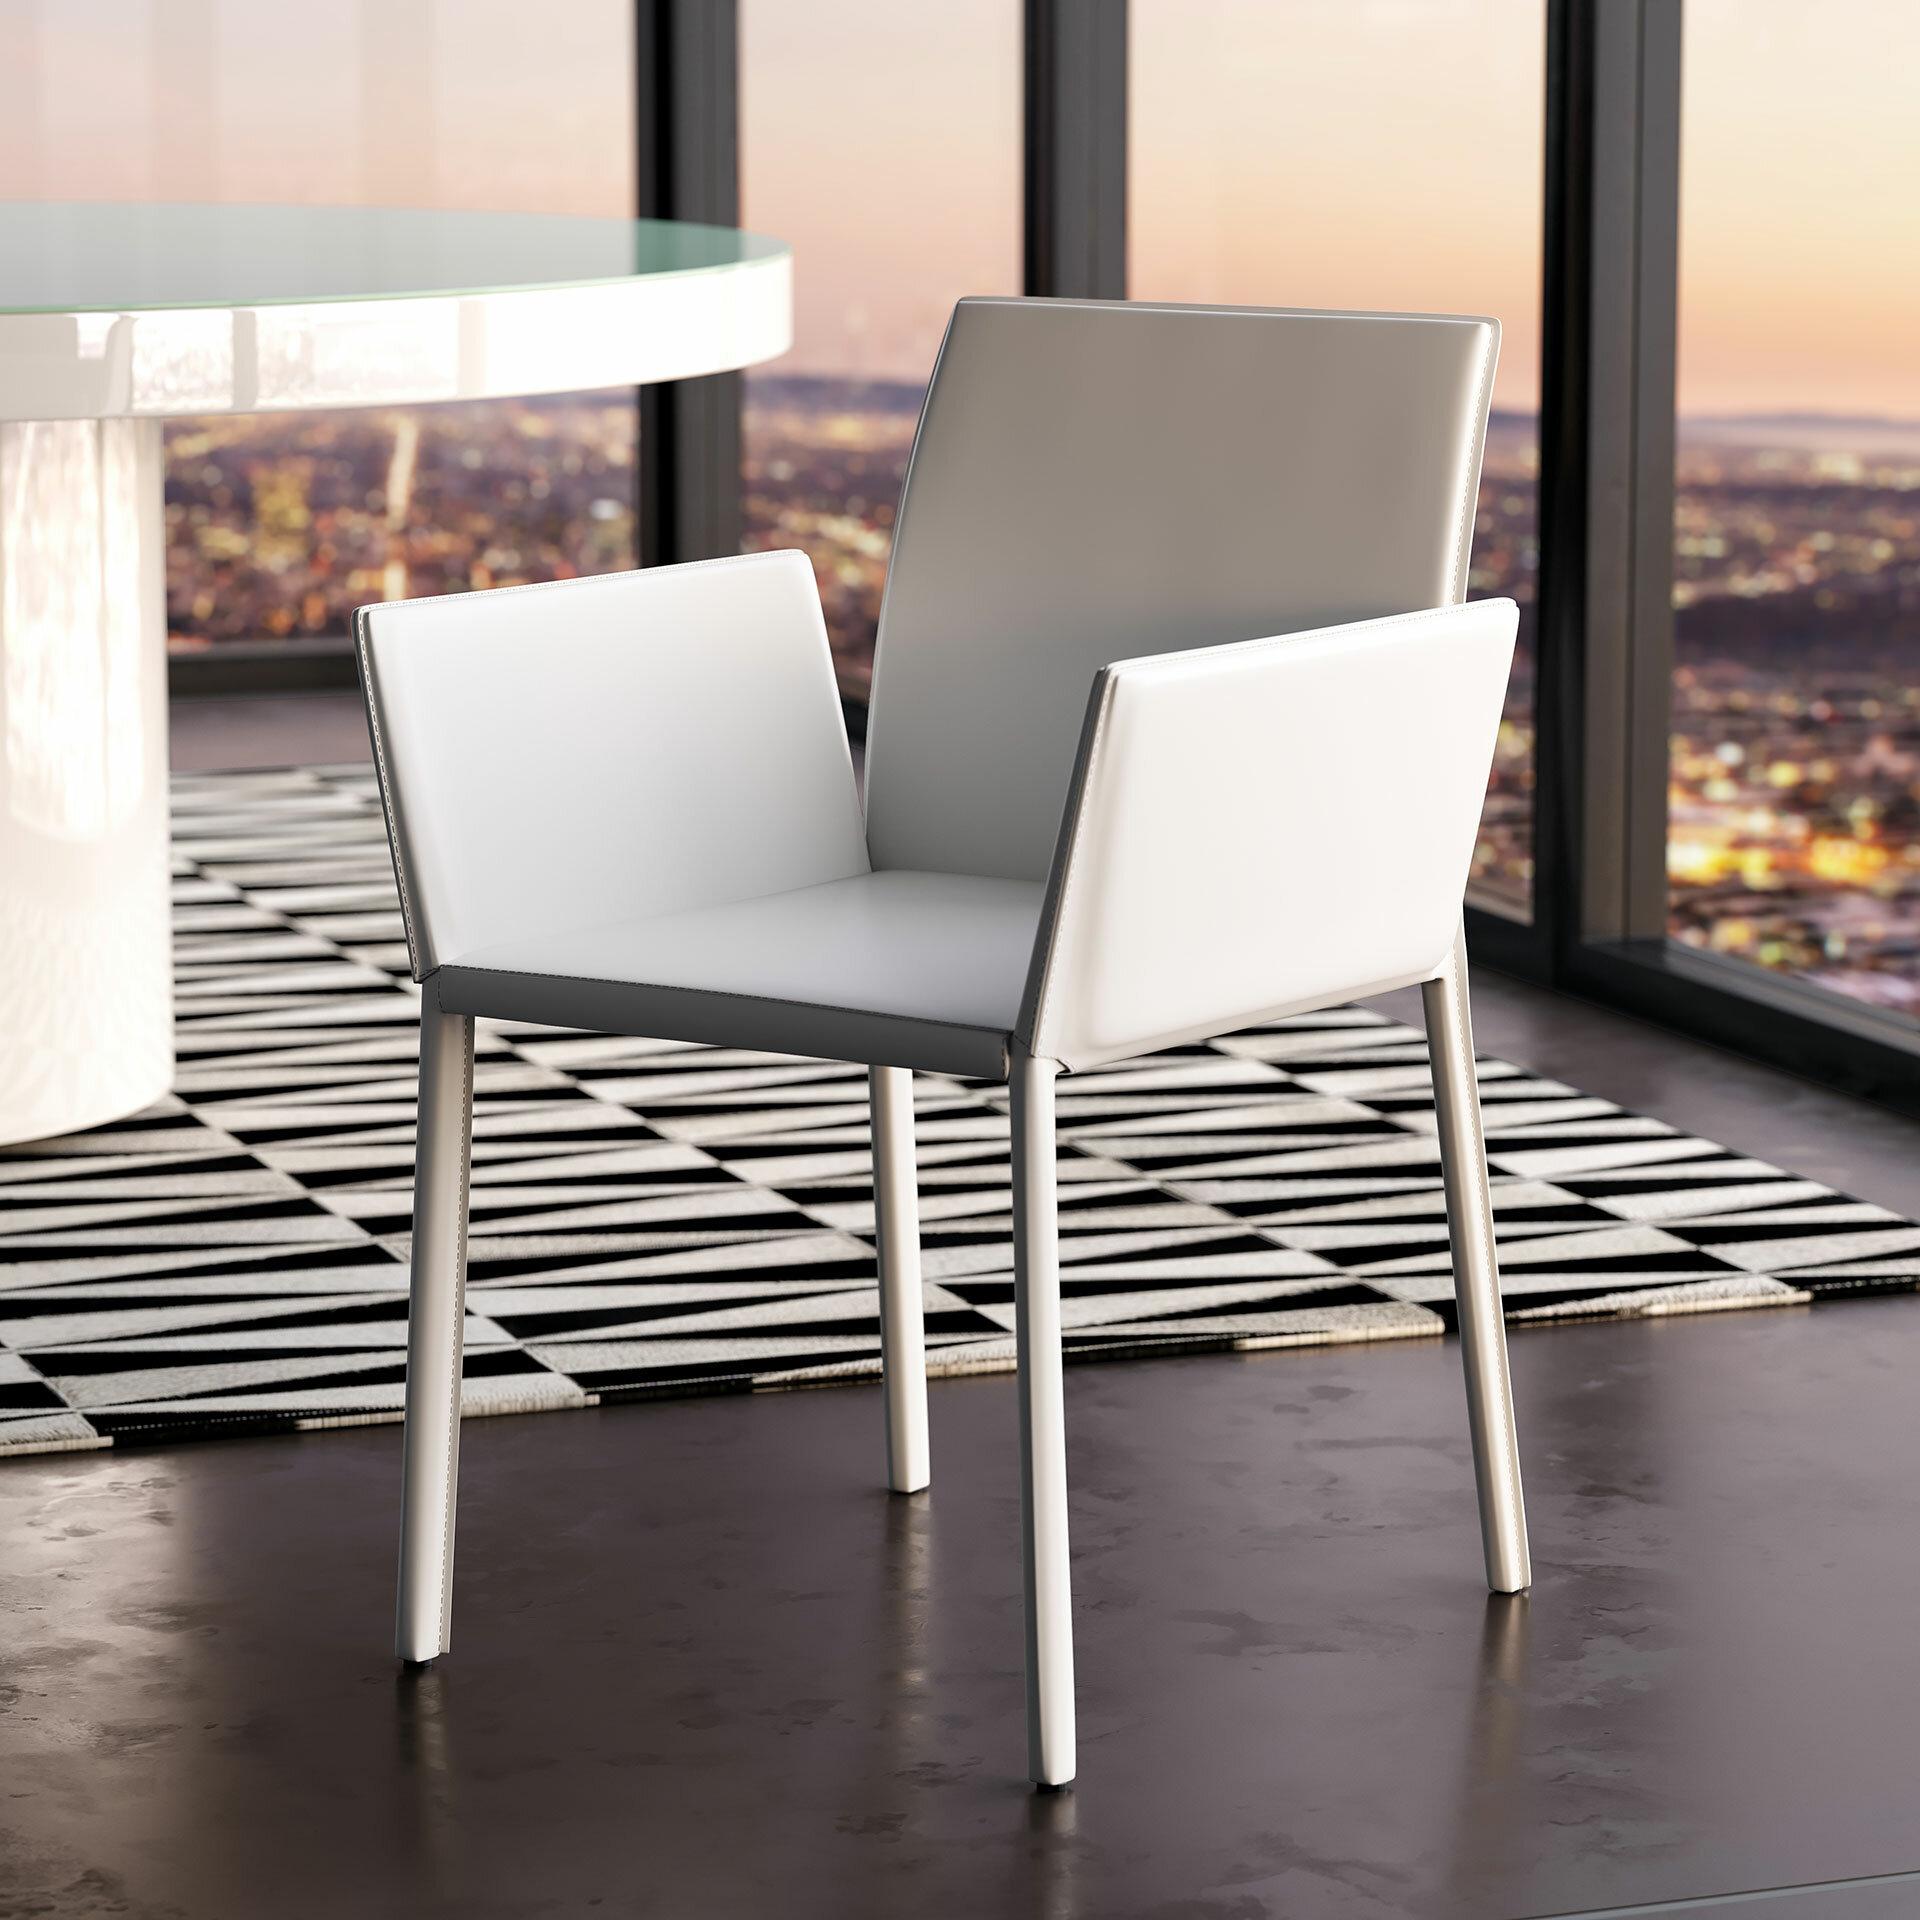 Swell Sanctuary Arm Upholstered Dining Chair Short Links Chair Design For Home Short Linksinfo